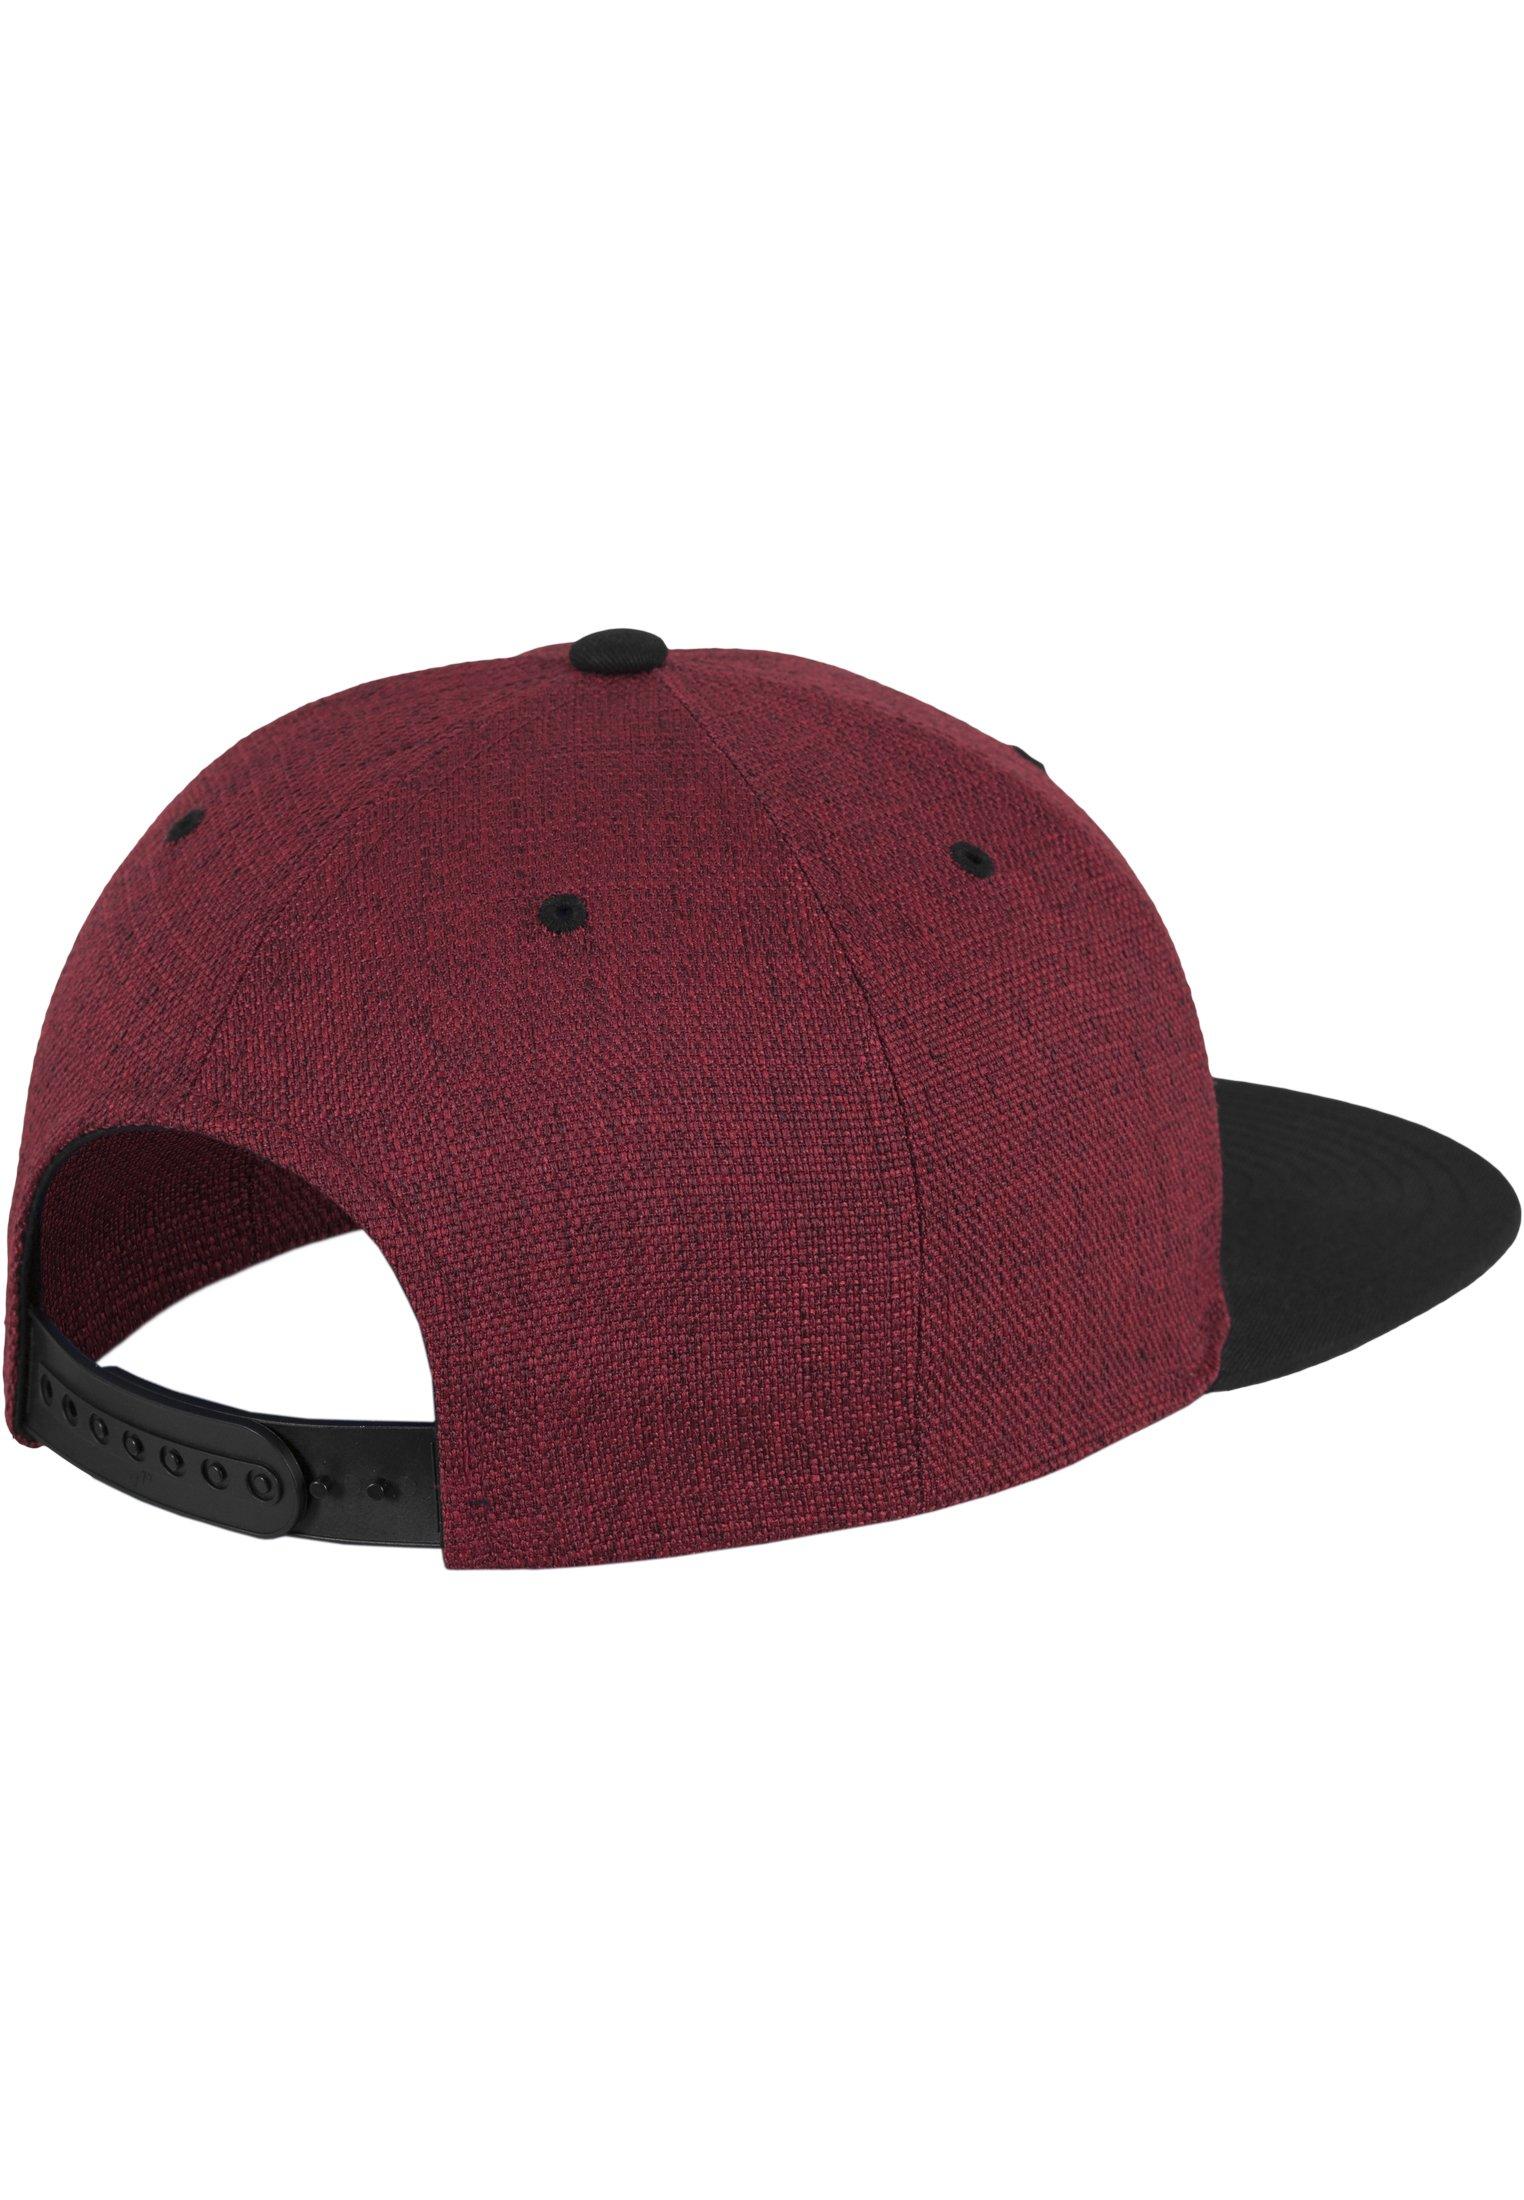 Flexfit Cap - Red/blk/rot